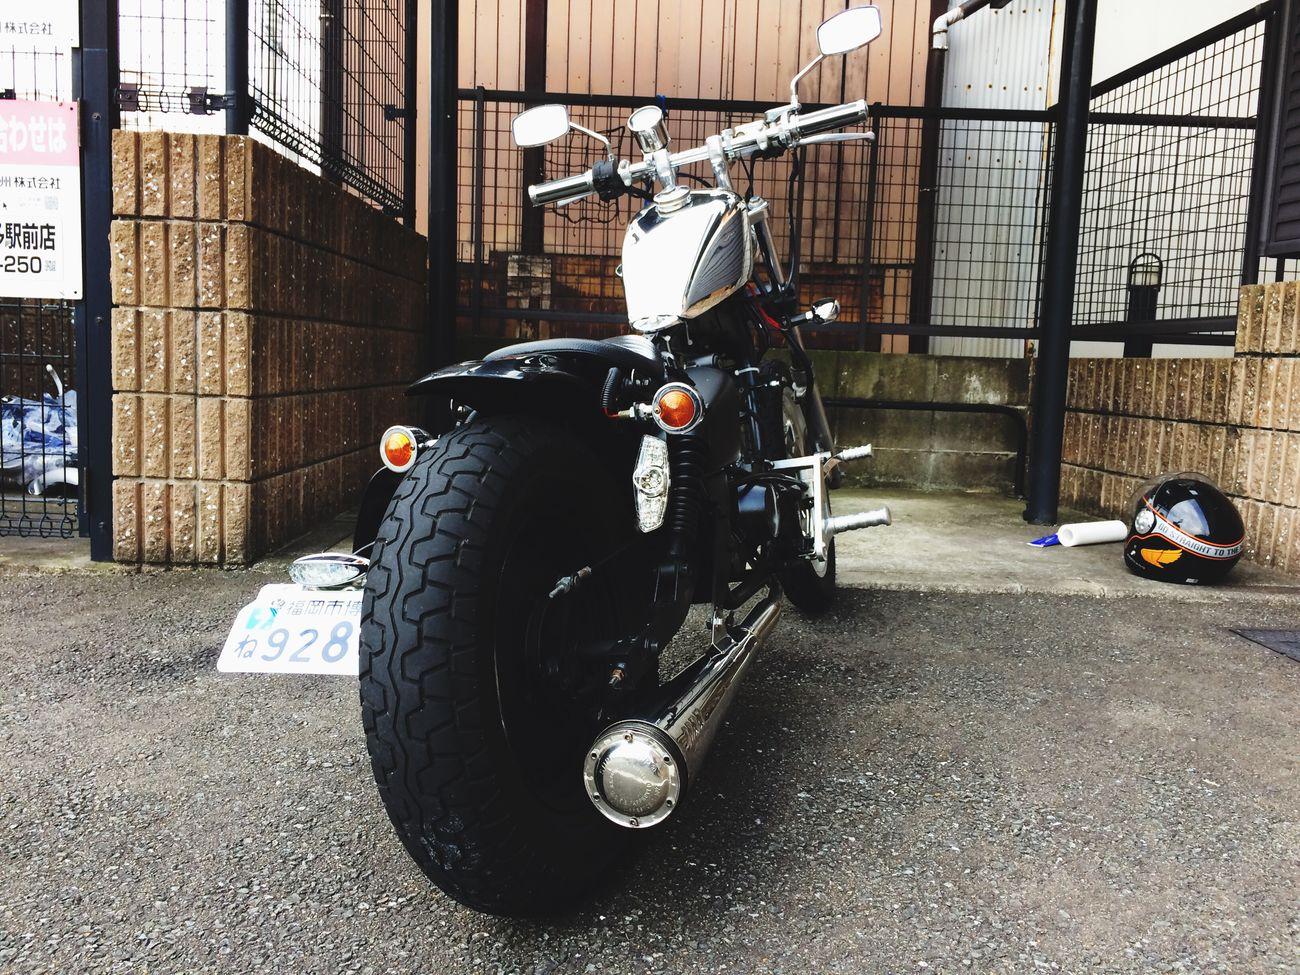 Magna50 マグナ50 Motercycle Moterbike Honda